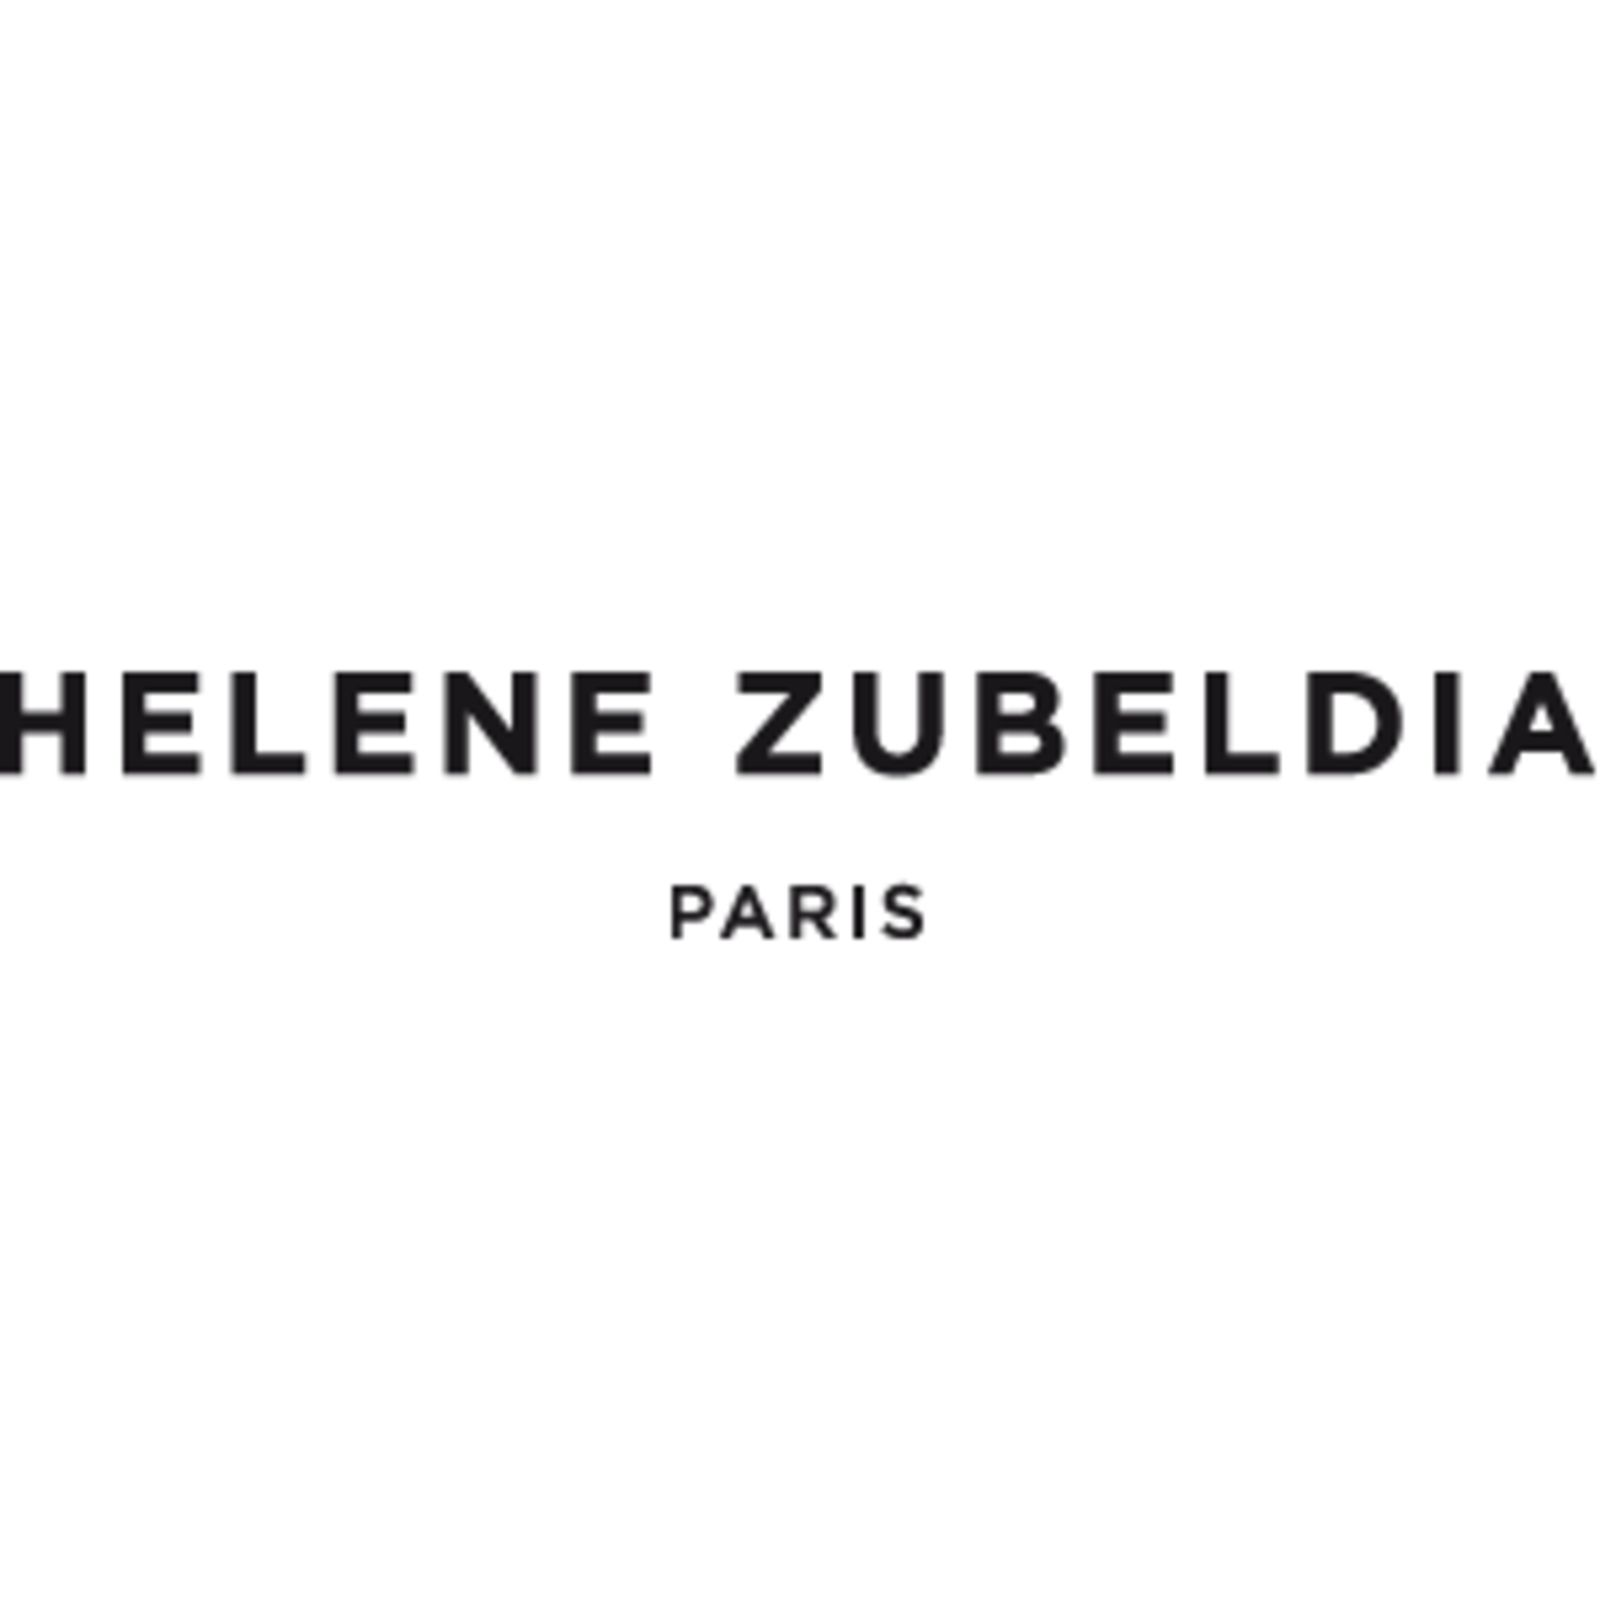 HELENE ZUBELDIA